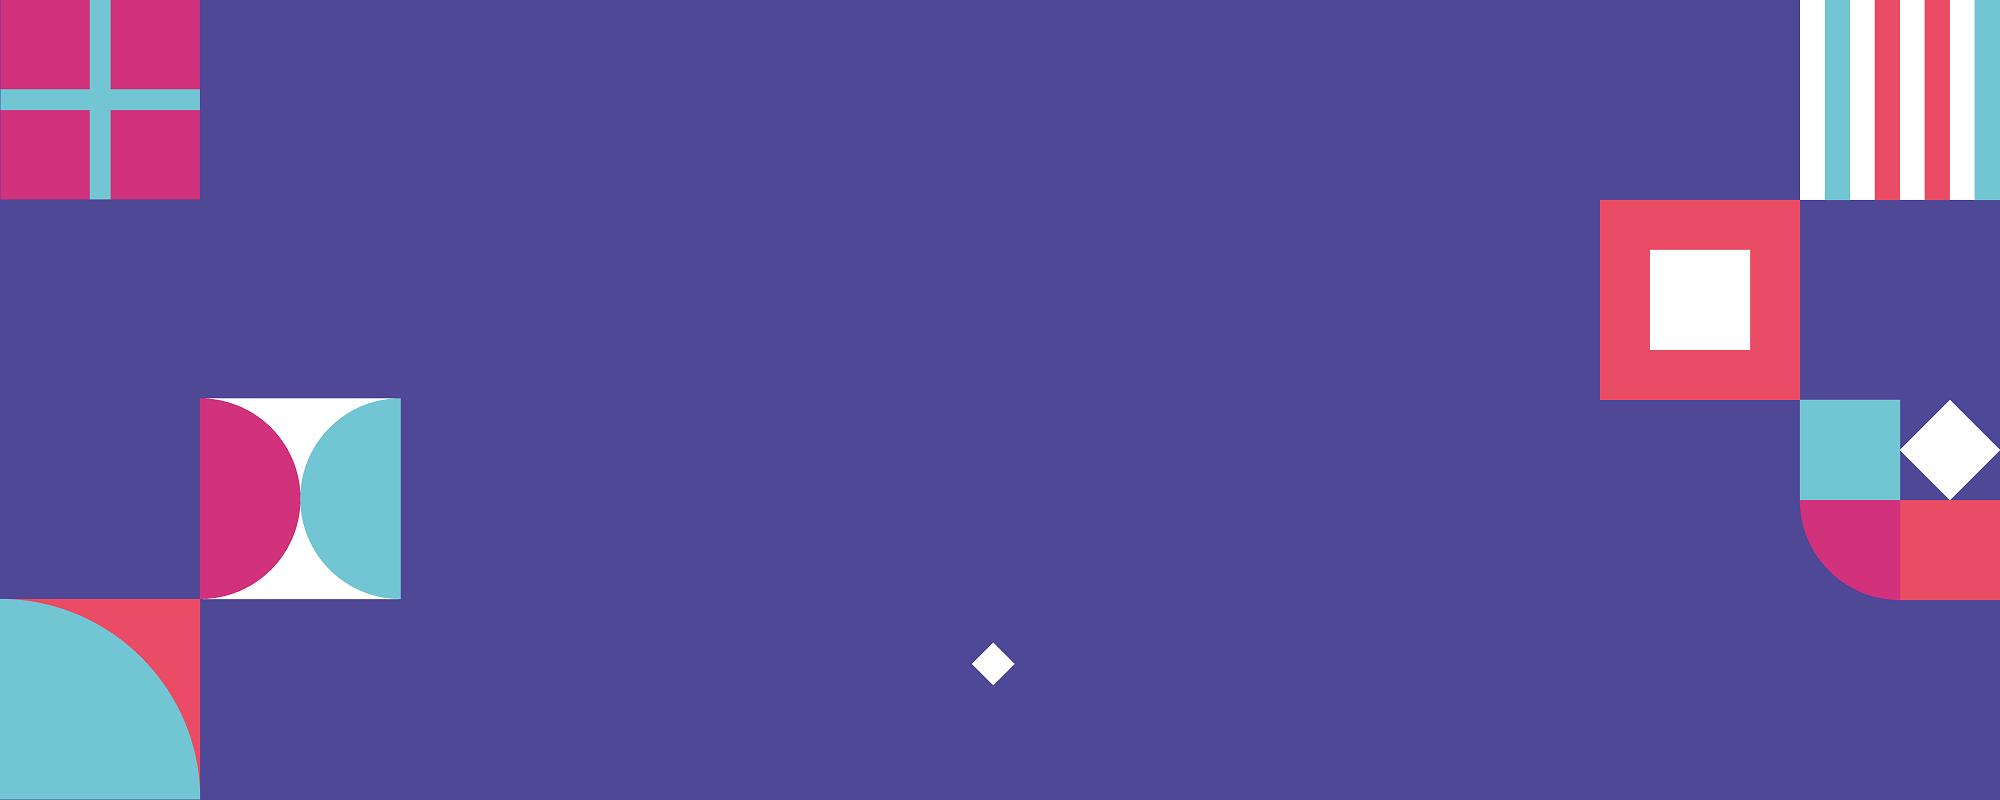 Puzzle_services_banner_website_design